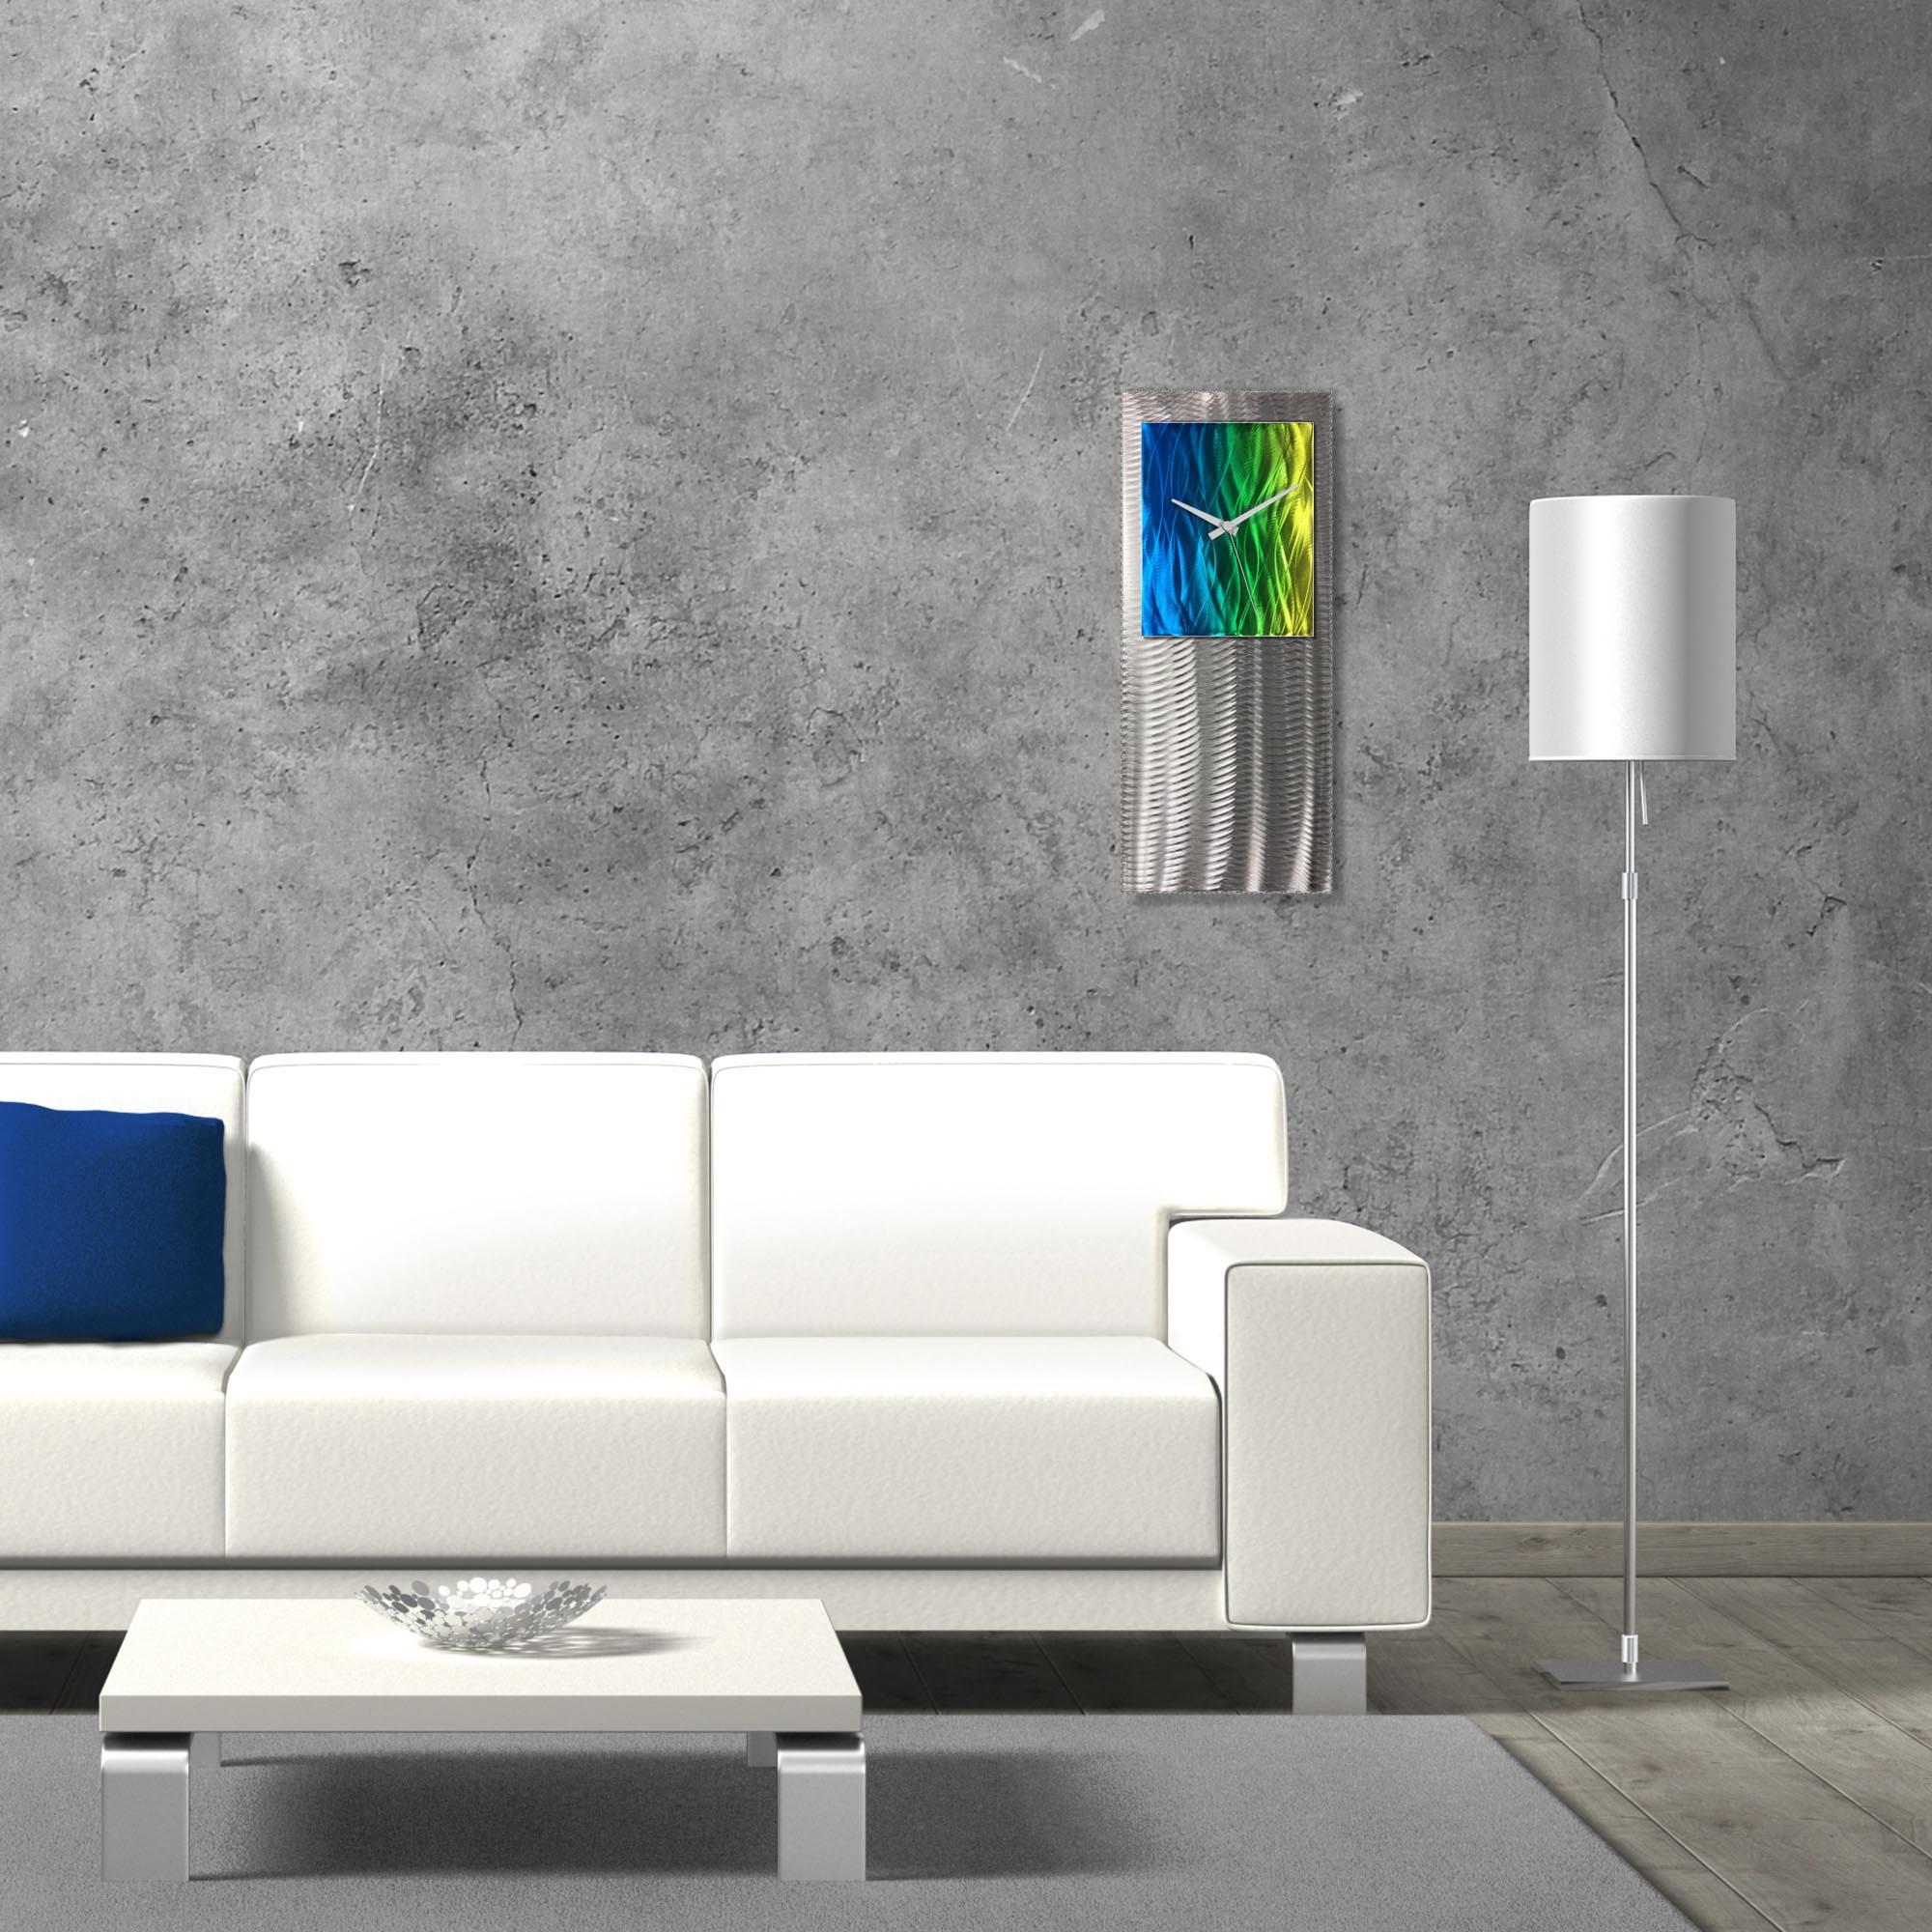 Metal Art Studio Abstract Decor Elements Studio Clock 10in x 24in - Lifestyle View